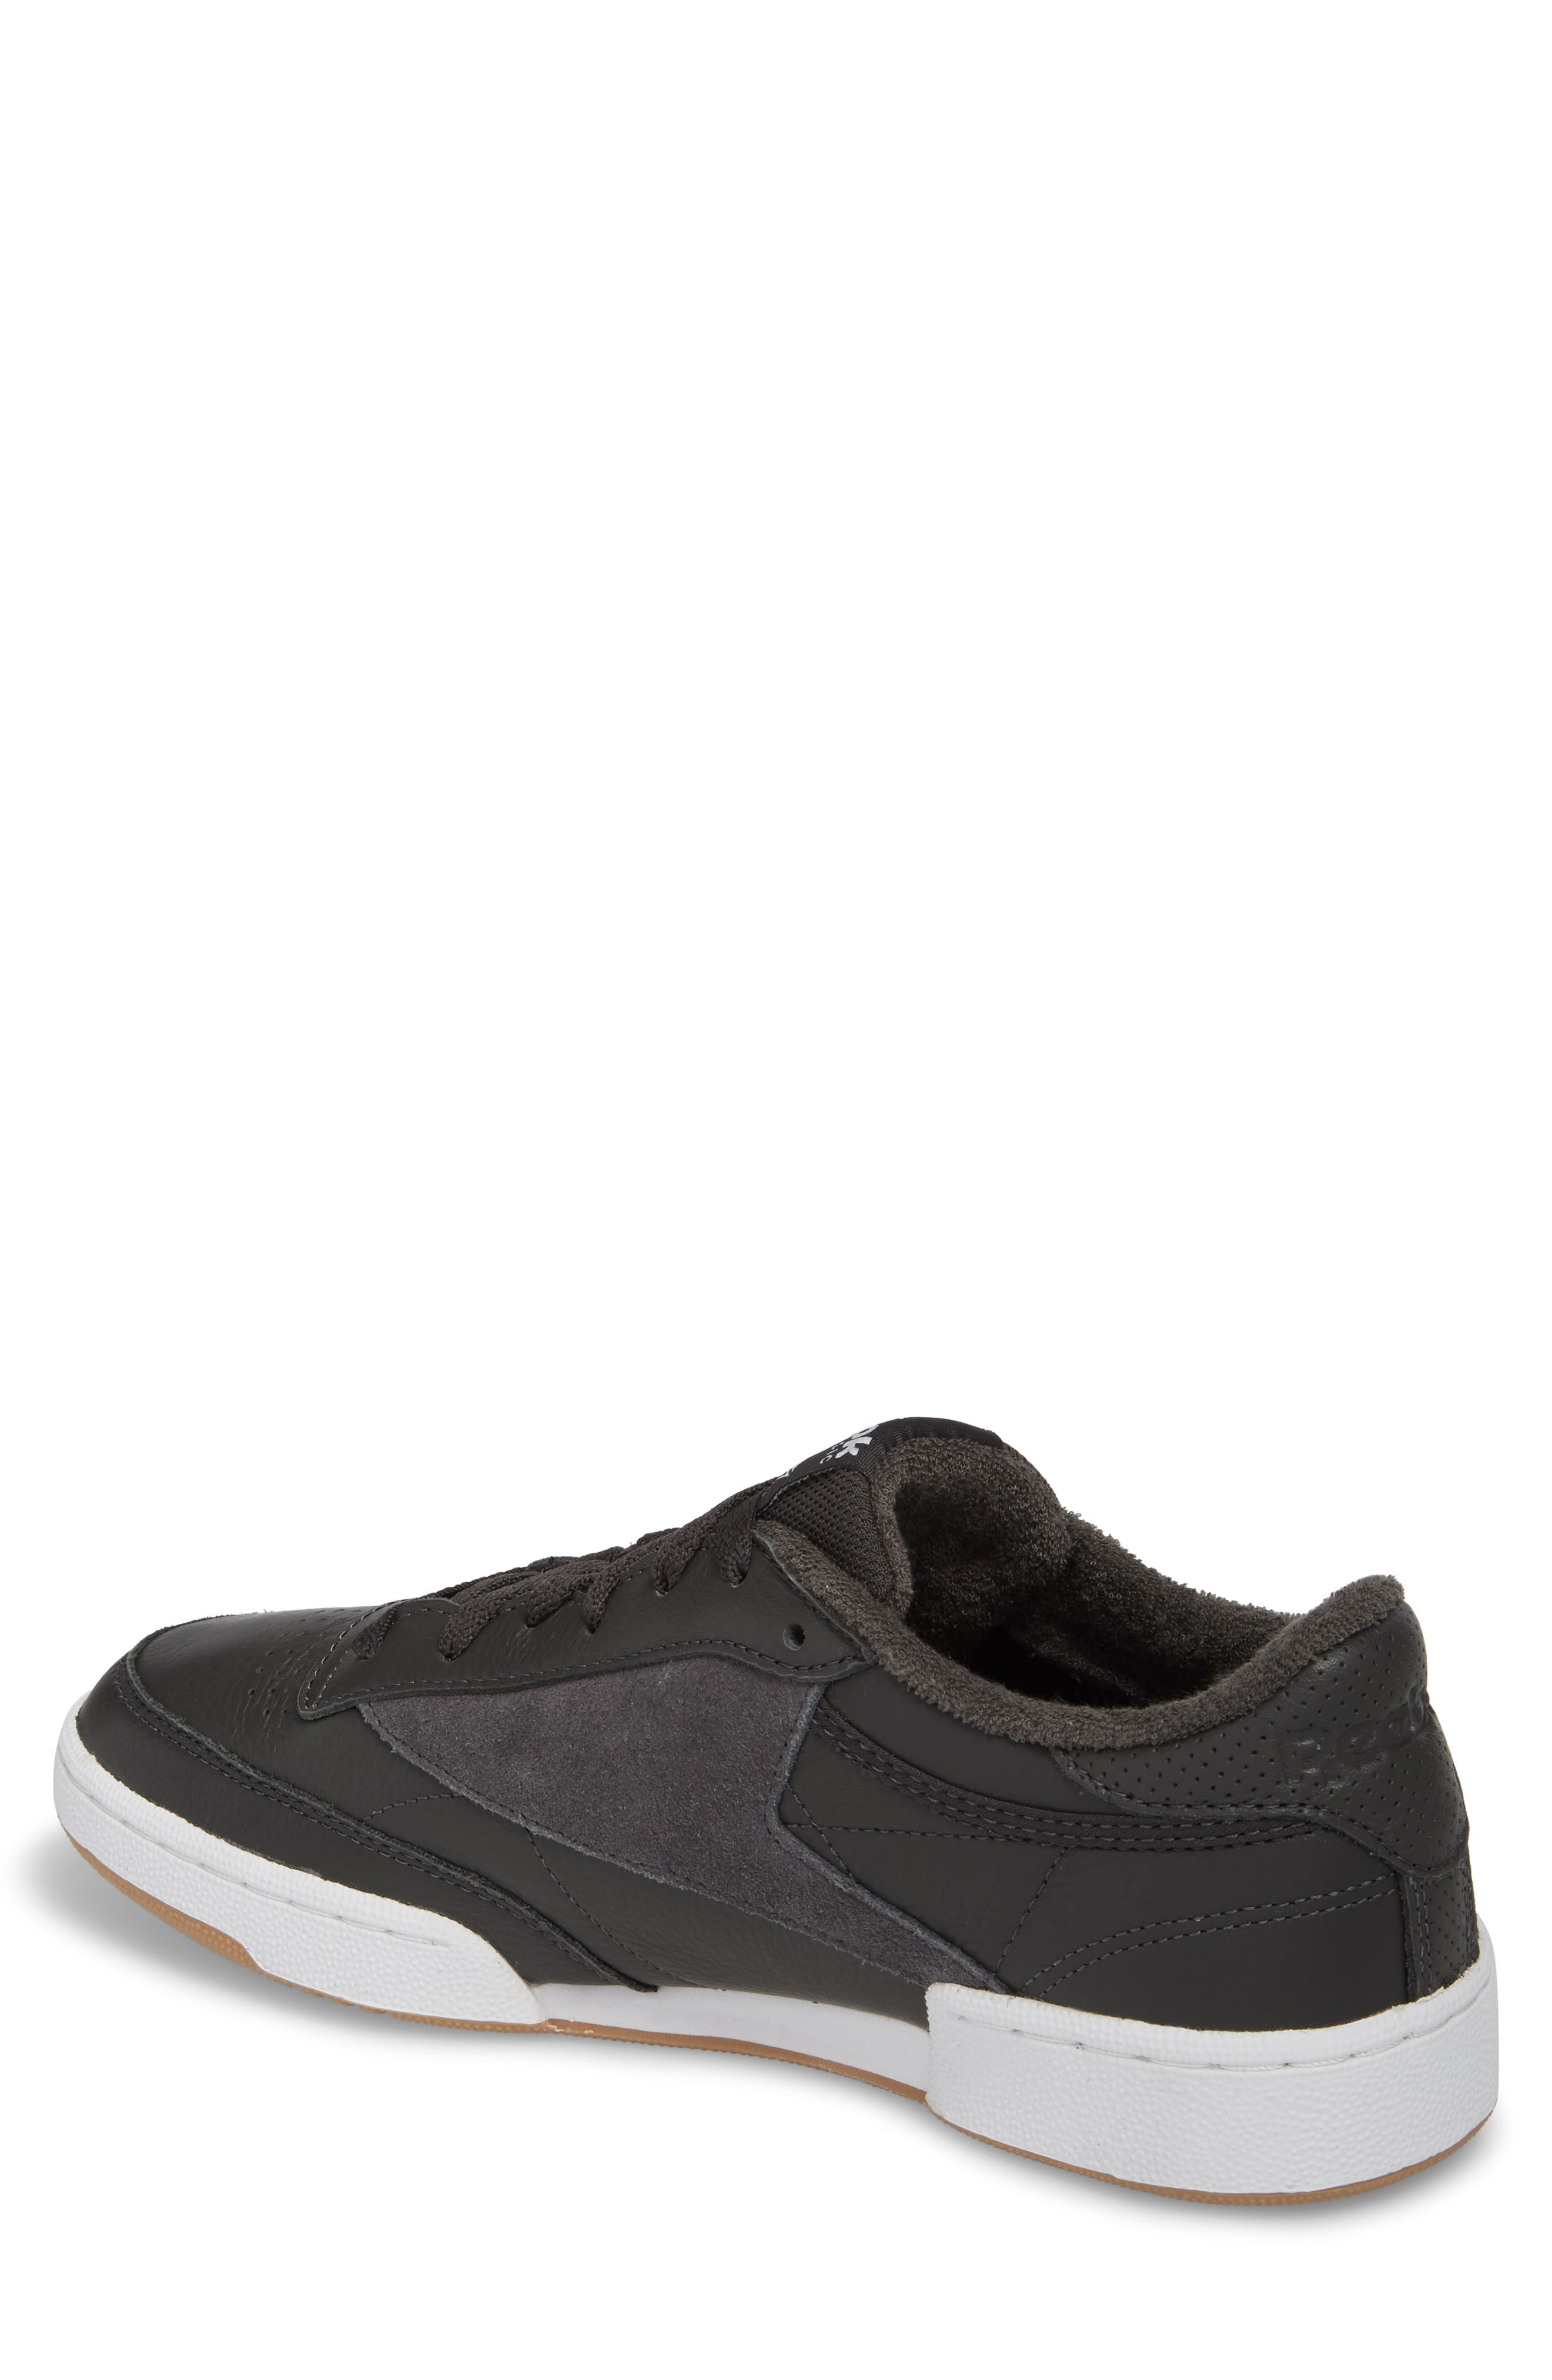 Club C 85 ESTL Sneaker,                             Alternate thumbnail 3, color,